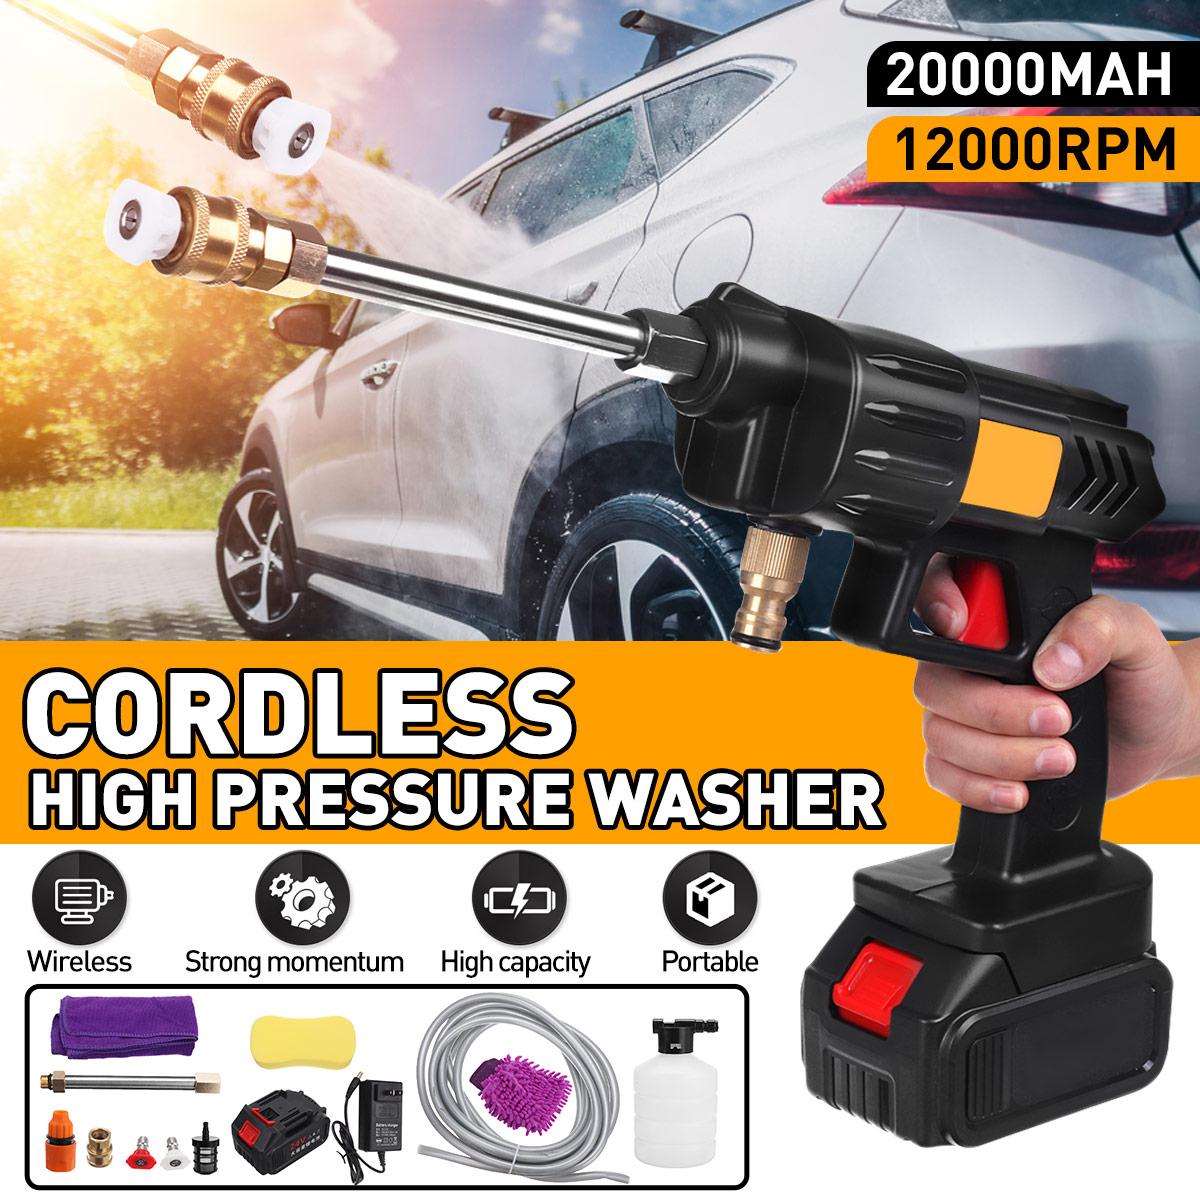 Car Washer Spray High Pressure Wireless Cordless Washer Water Cleaner Car Wash Pressure Water Nozzle Cleaning Machine Home 300W